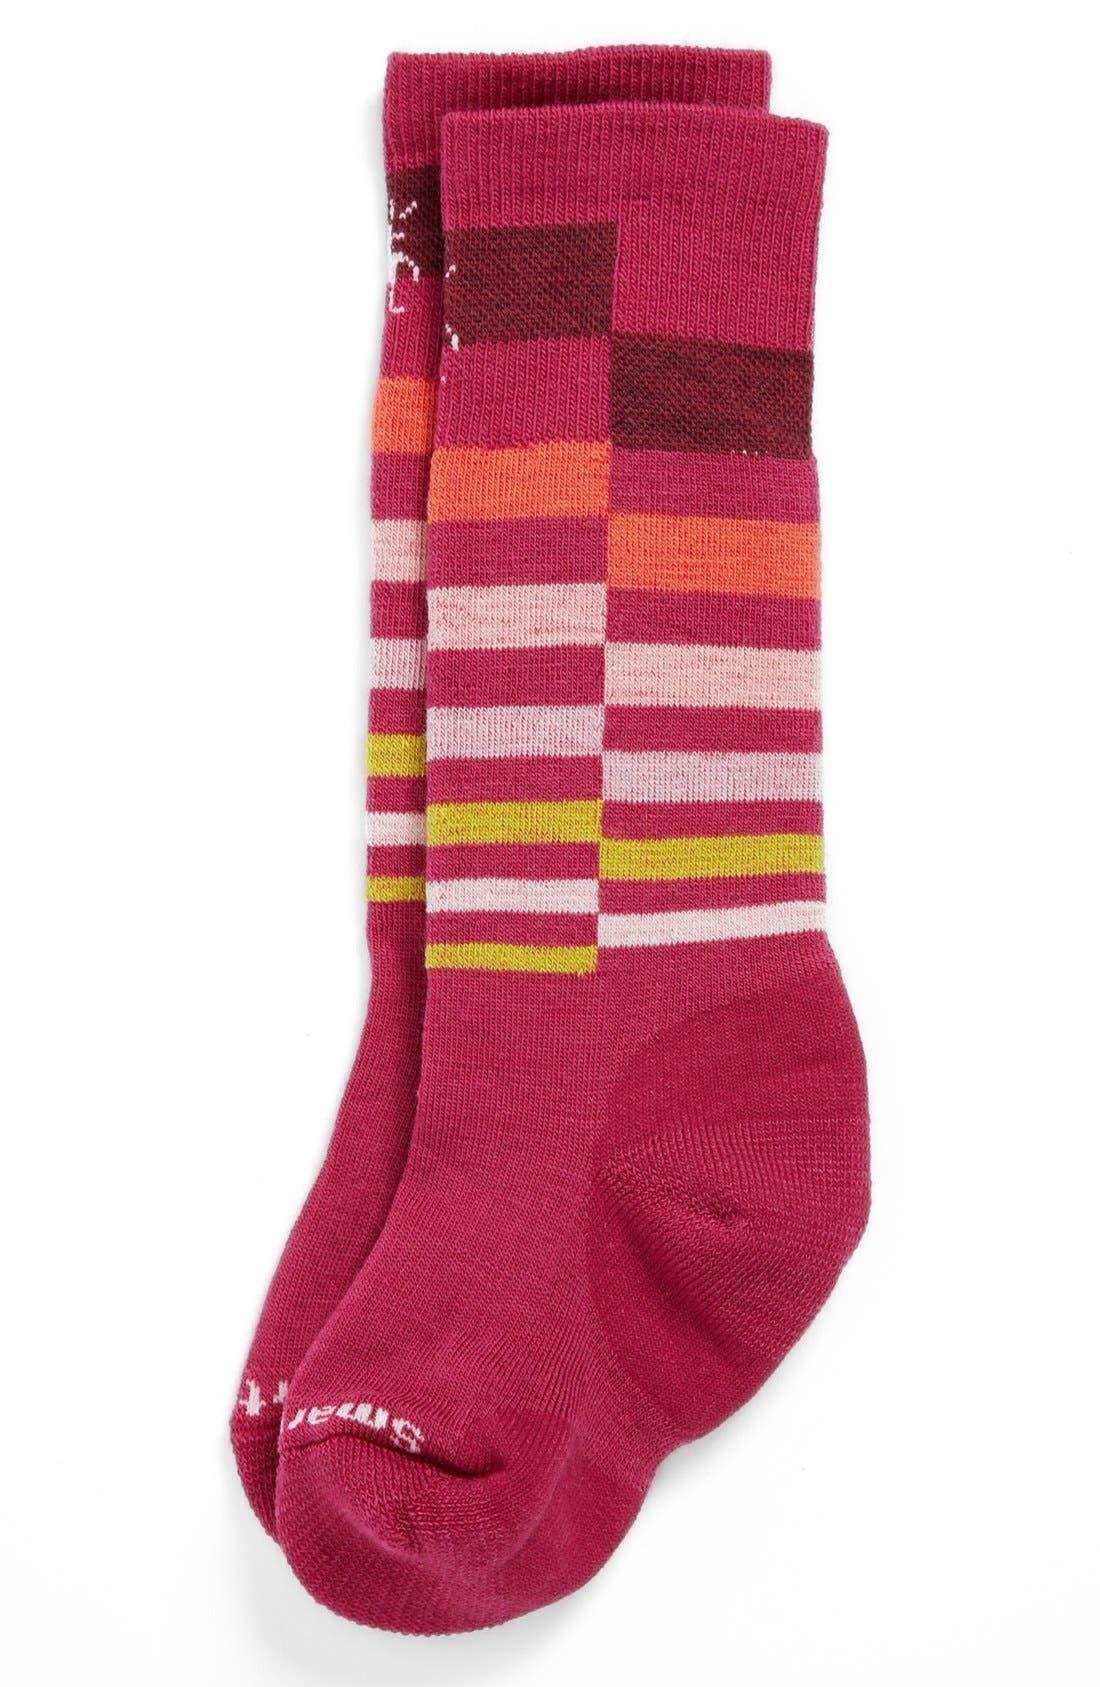 Alternate Image 1 Selected - Smartwool 'Wintersport Stripe' Socks (Little Girls & Big Girls)